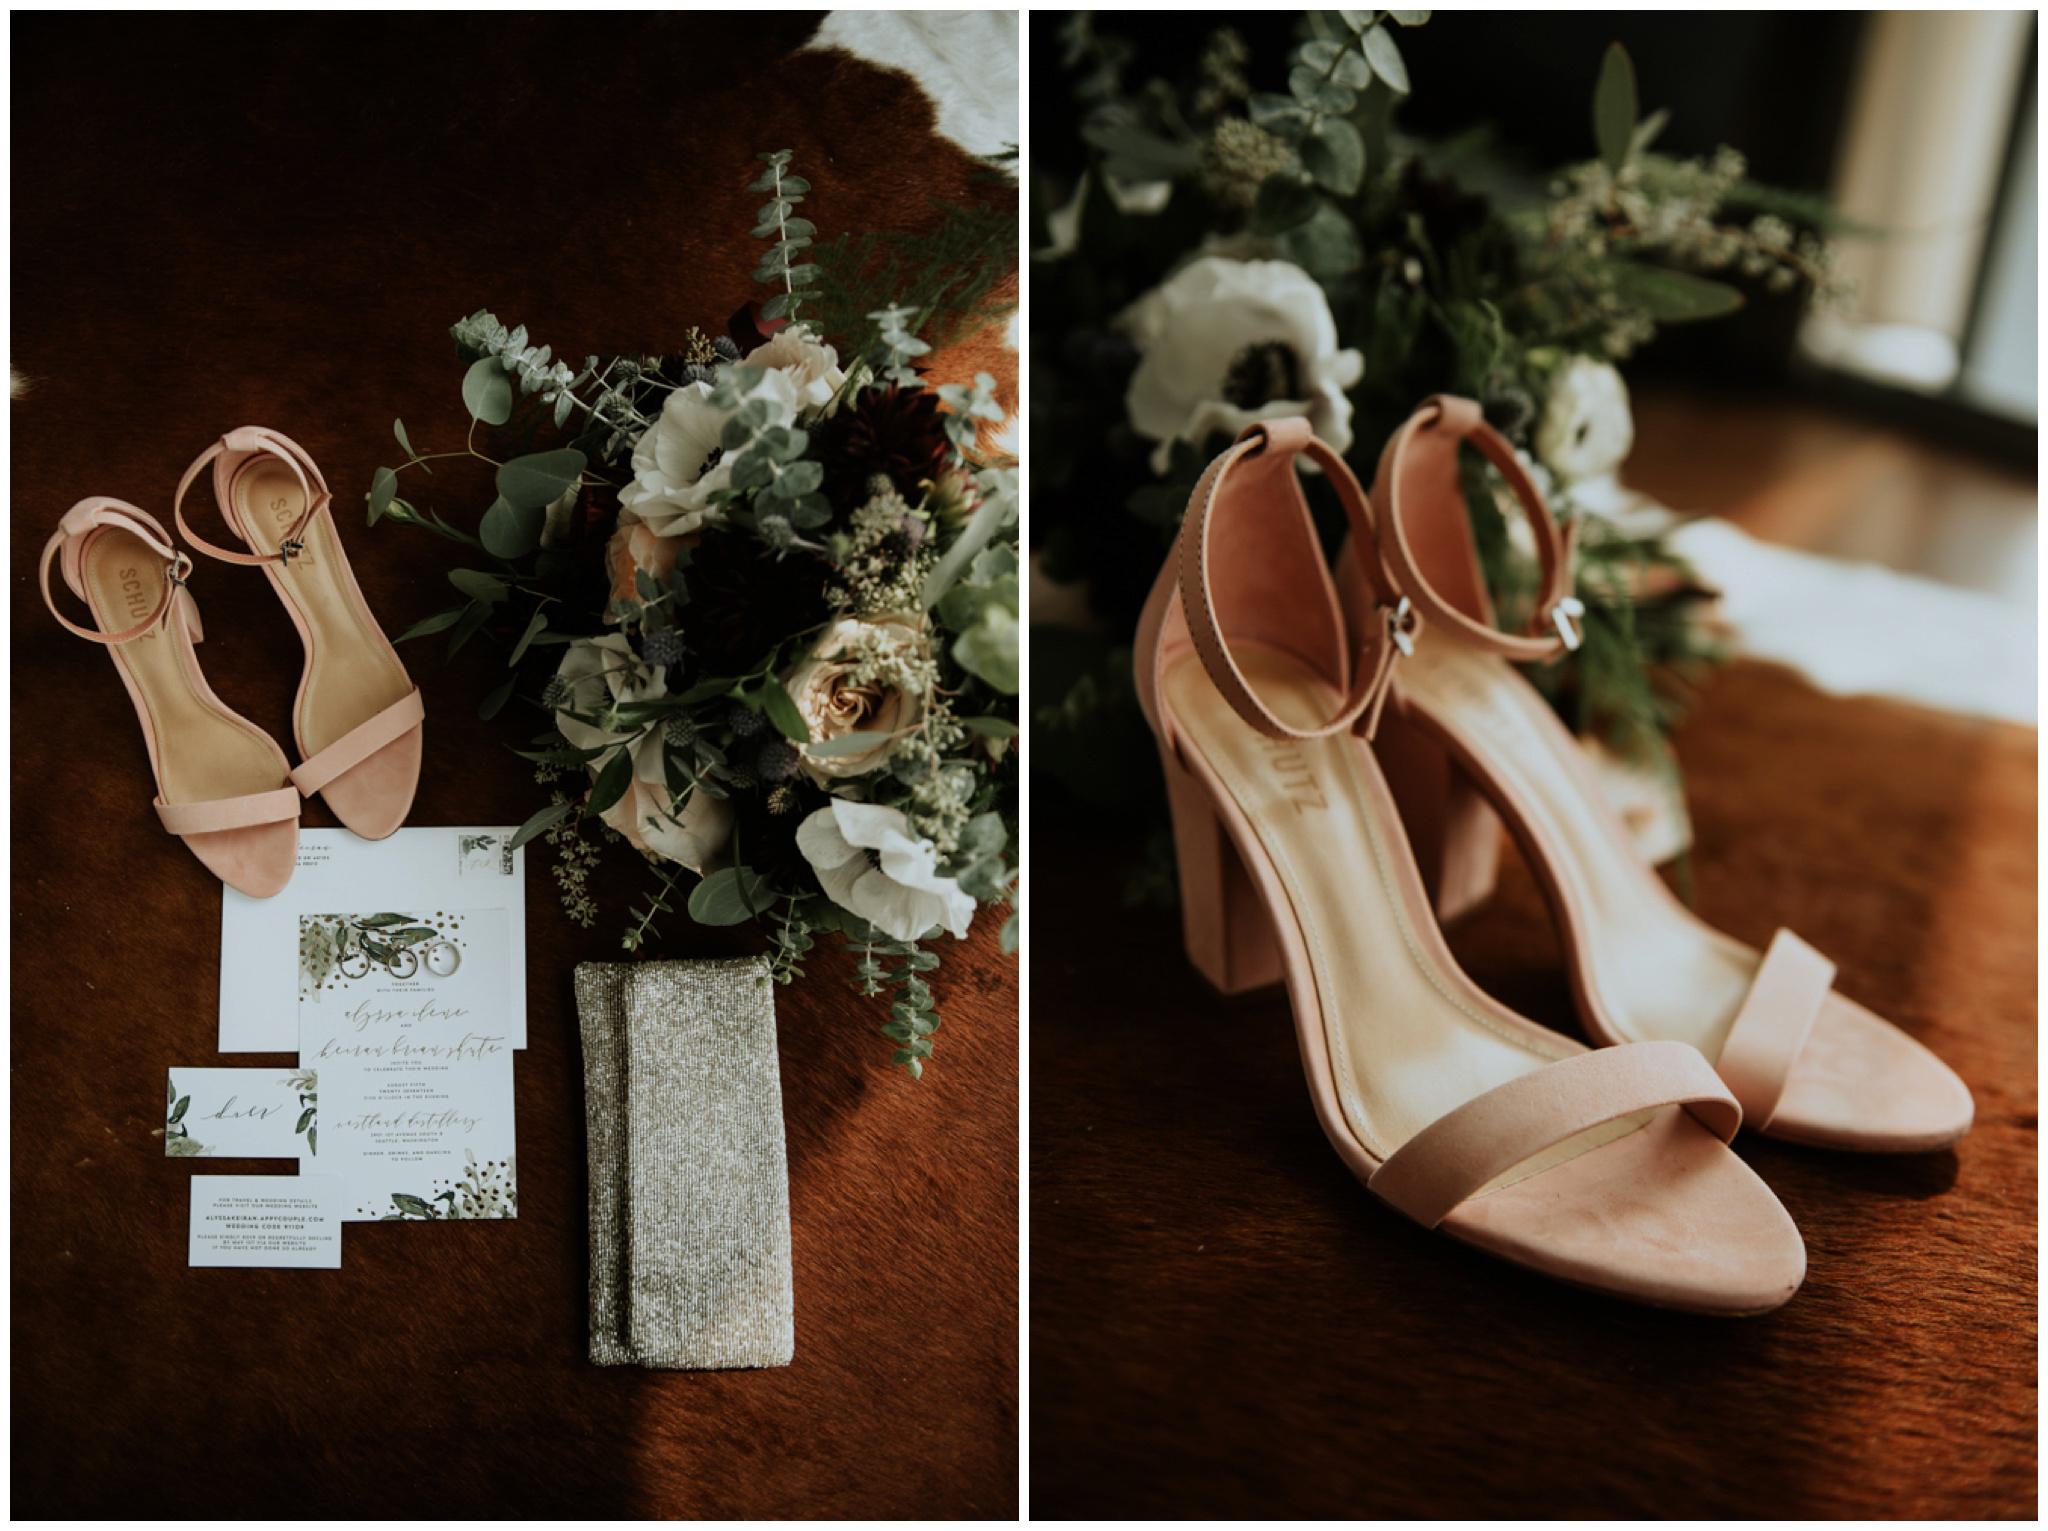 alyssa-keiran-westland-distillery-urban-seattle-wedding-photographer-caitlyn-nikula-22.jpg